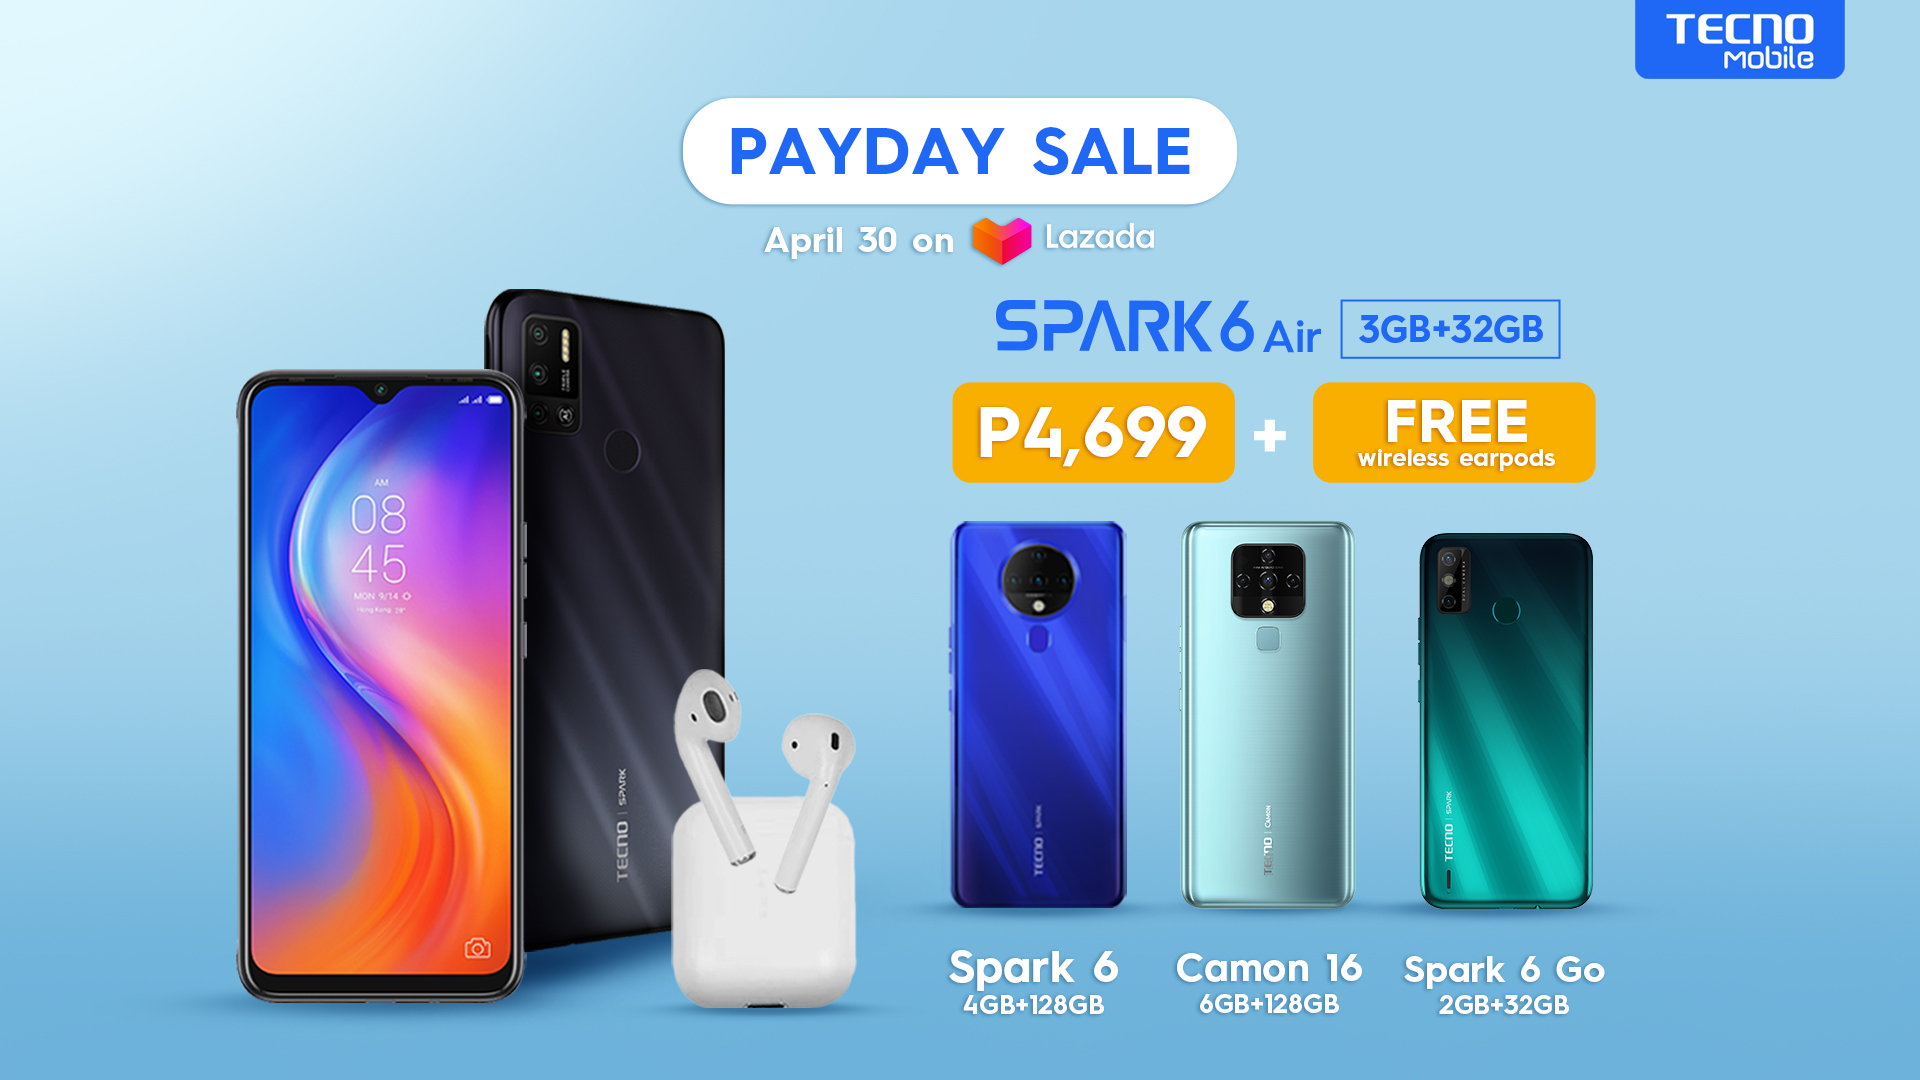 TECNO Mobile Spark 6 Air, TECNO Mobile PayDay Sale